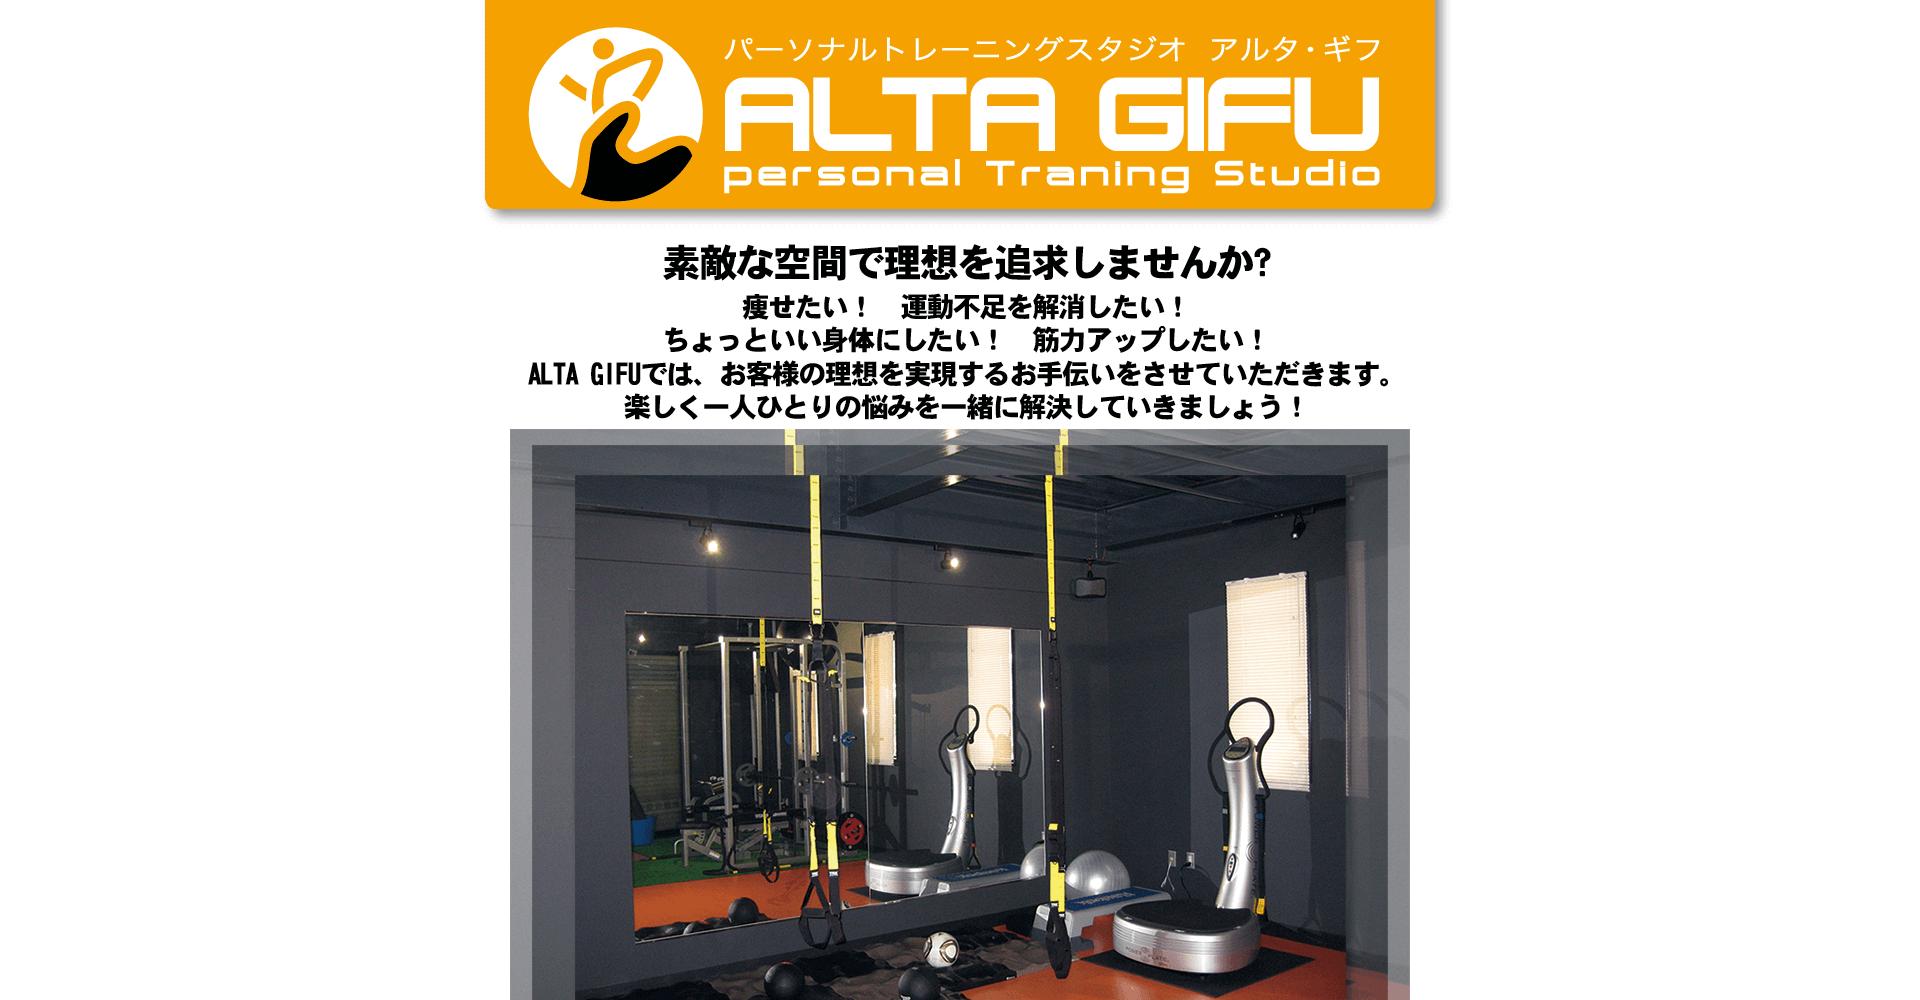 personal training studio ALTA GIFU(アルタギフ)